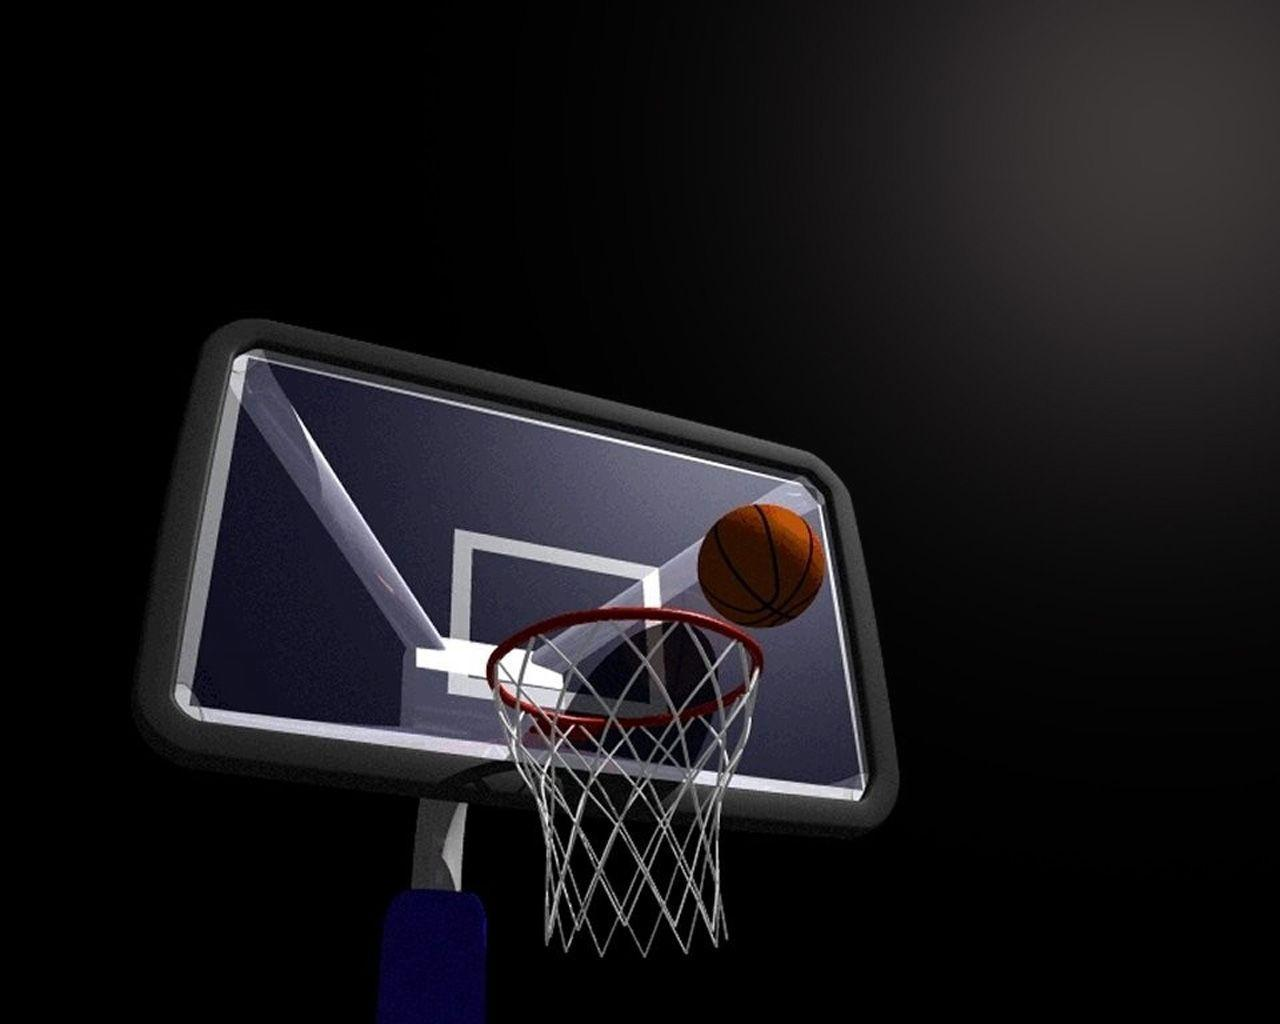 awesome basketball wallpapers unpixelated - photo #11